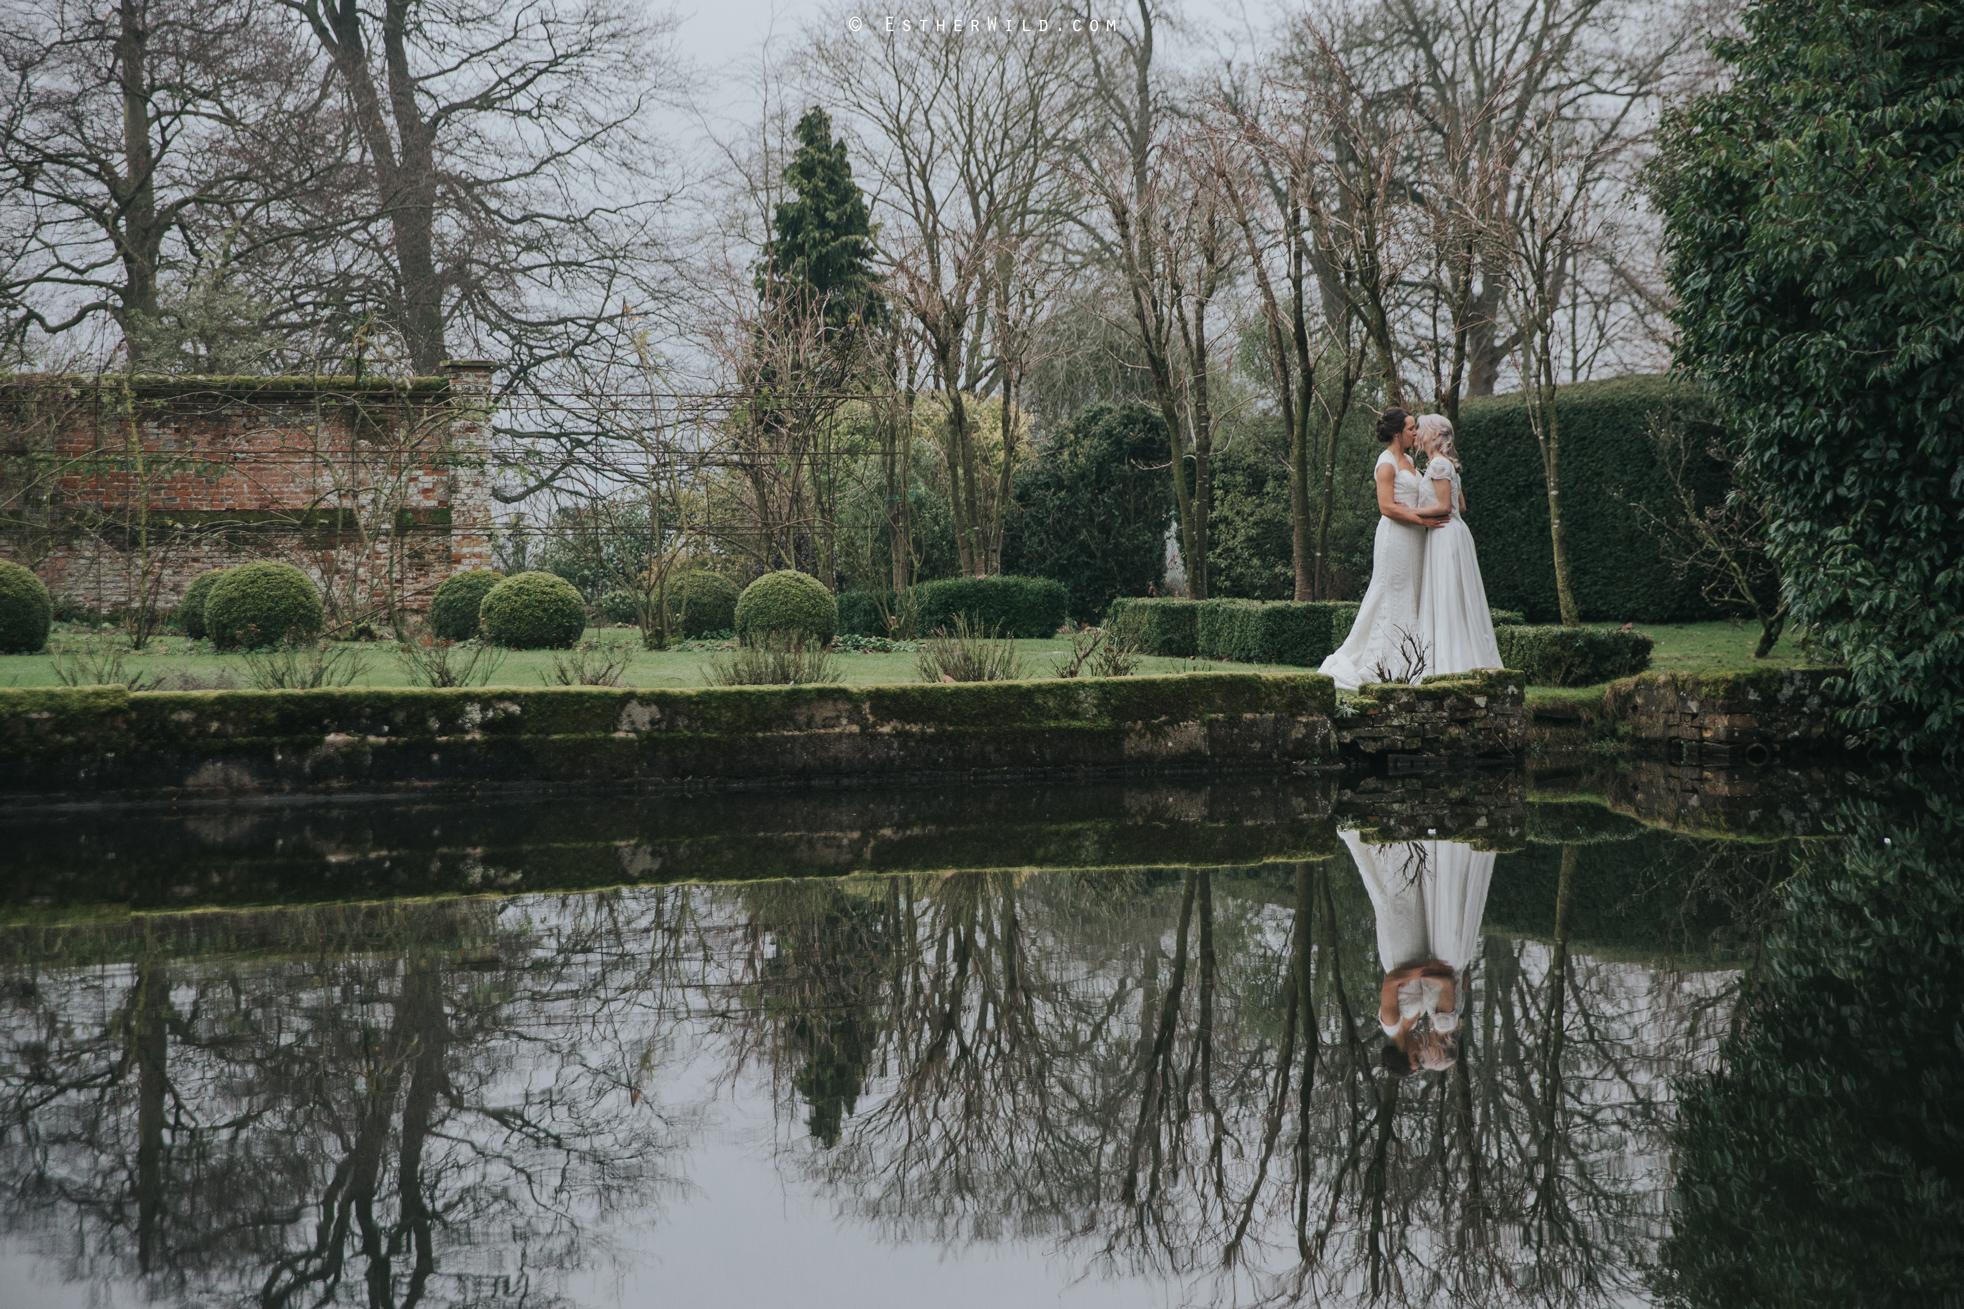 Elms_Barn_Weddings_Suffolk_Photographer_Copyright_Esther_Wild_IMG_2084.jpg